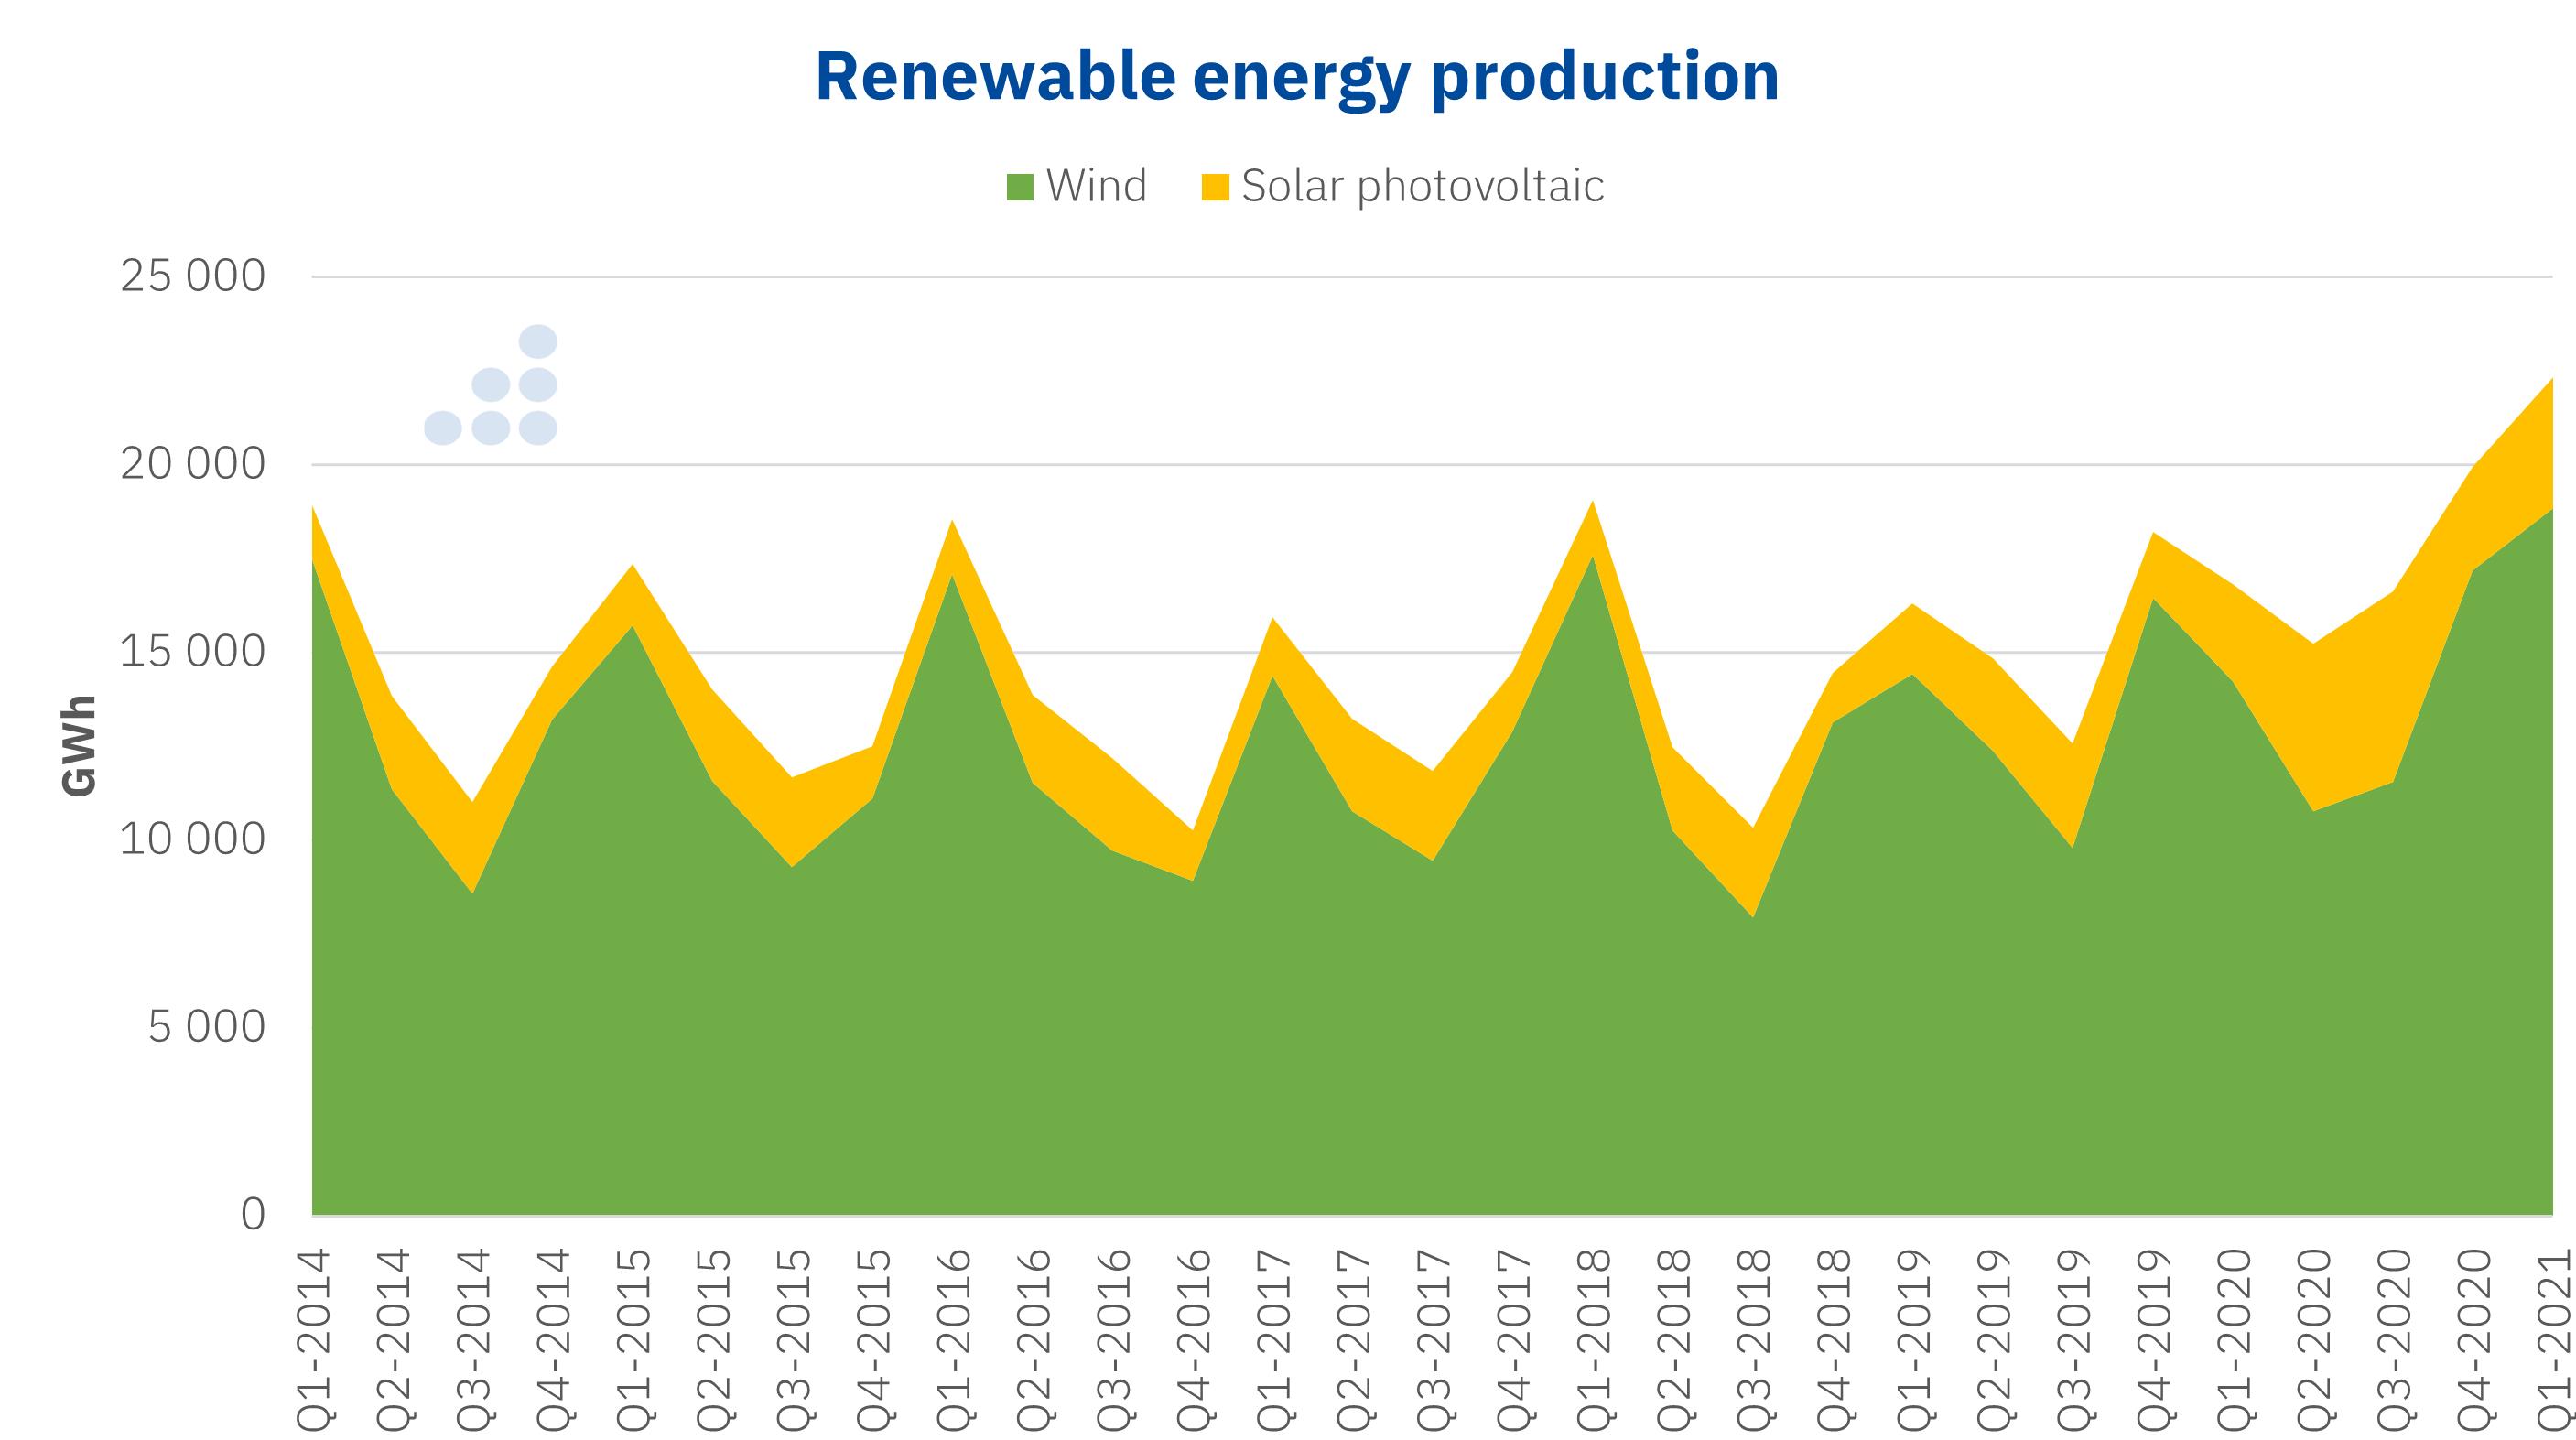 AleaSoft - Renewable energy wind photovoltaic